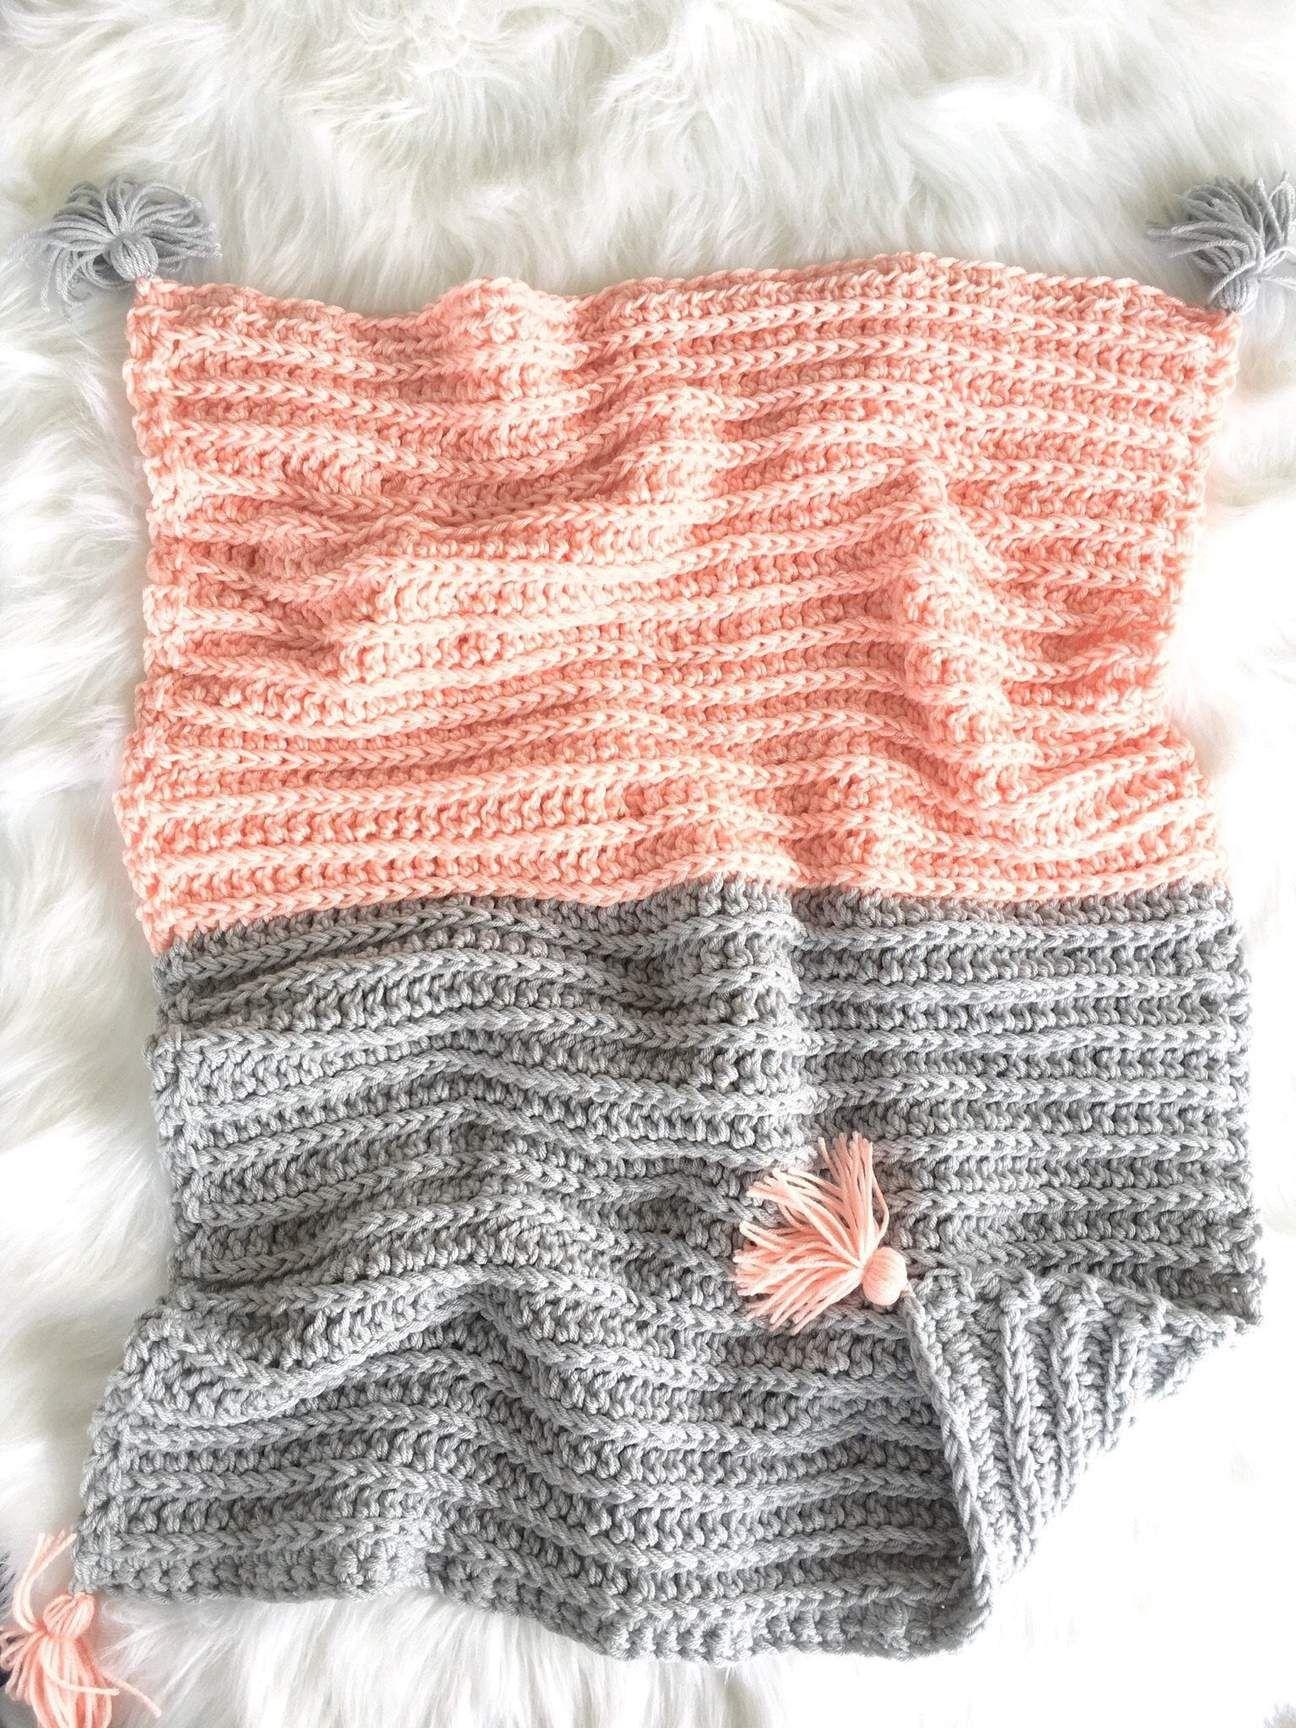 Photo of Crochet Boho Baby Girl Blanket in Pink and Grey